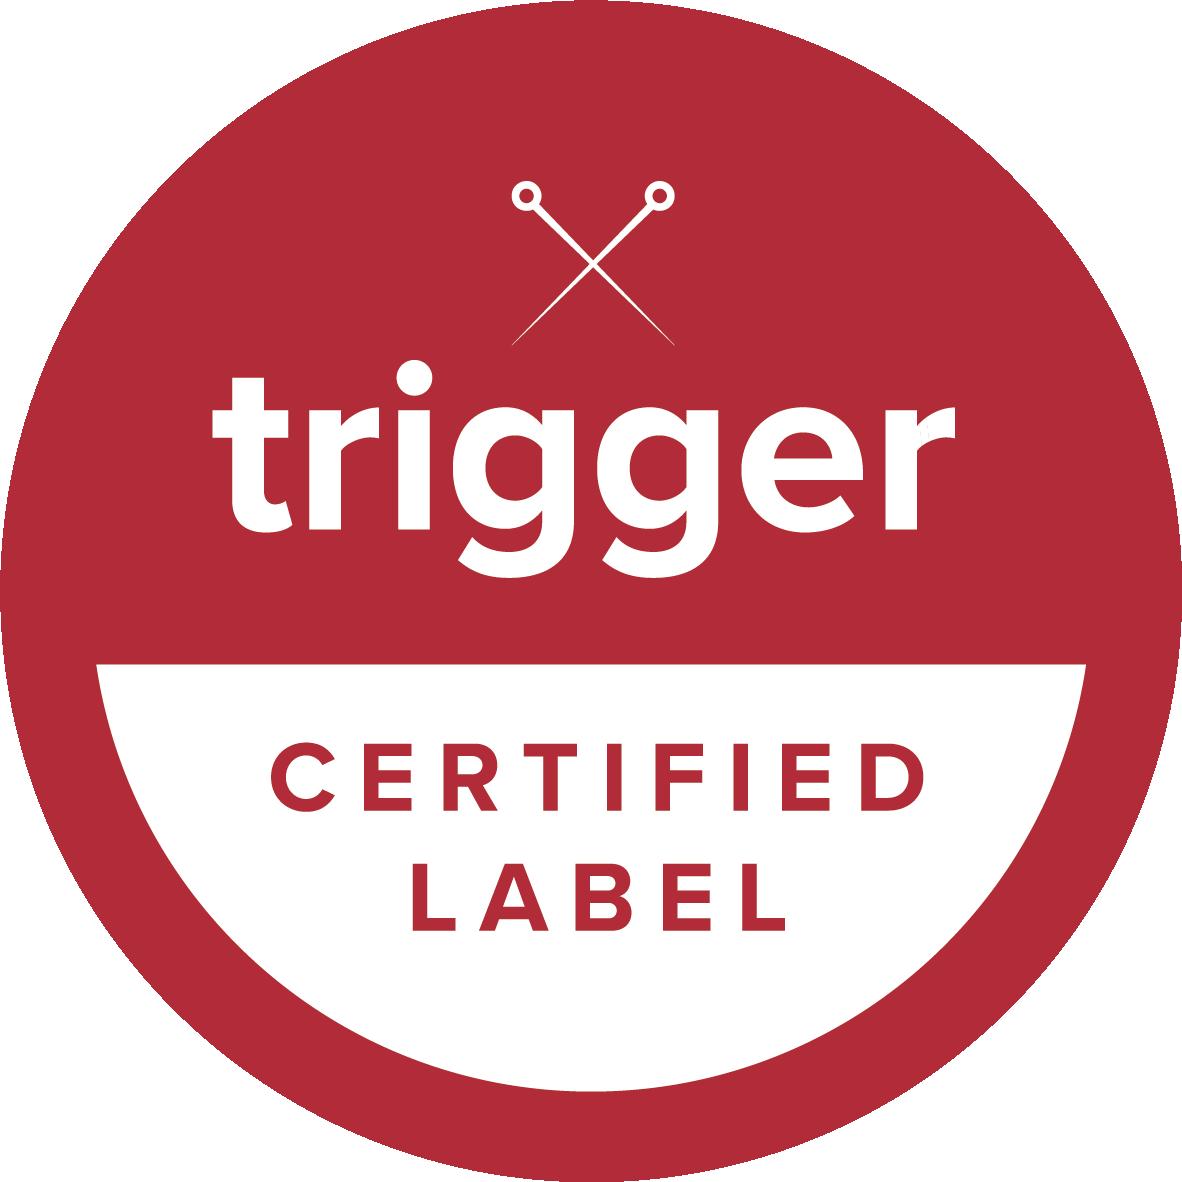 Trigger certified label